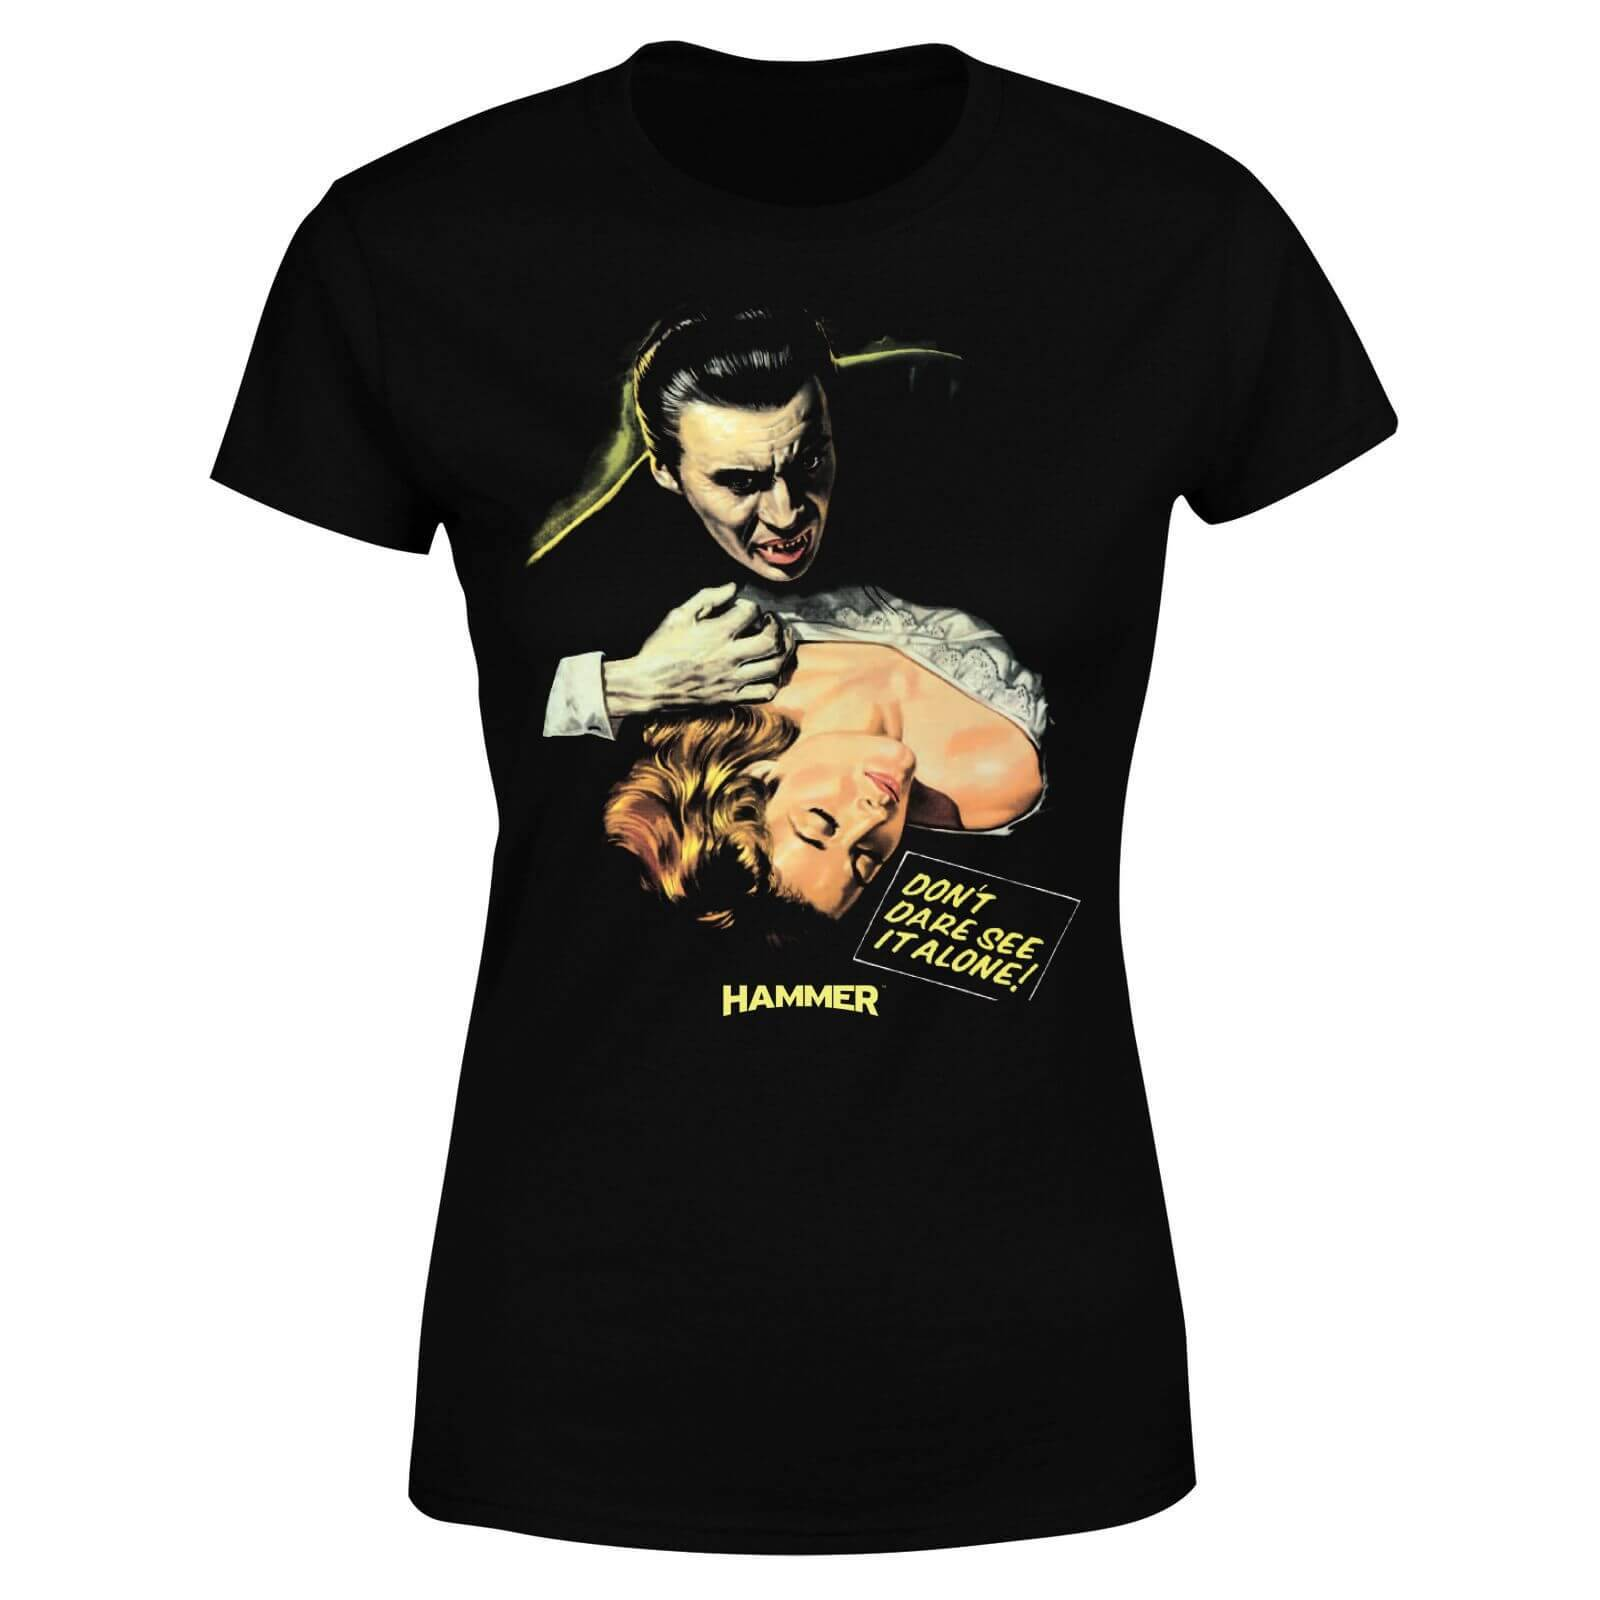 Hammer Horror Dracula Don't Dare See It Alone Women's T-Shirt - Black - XL - Black